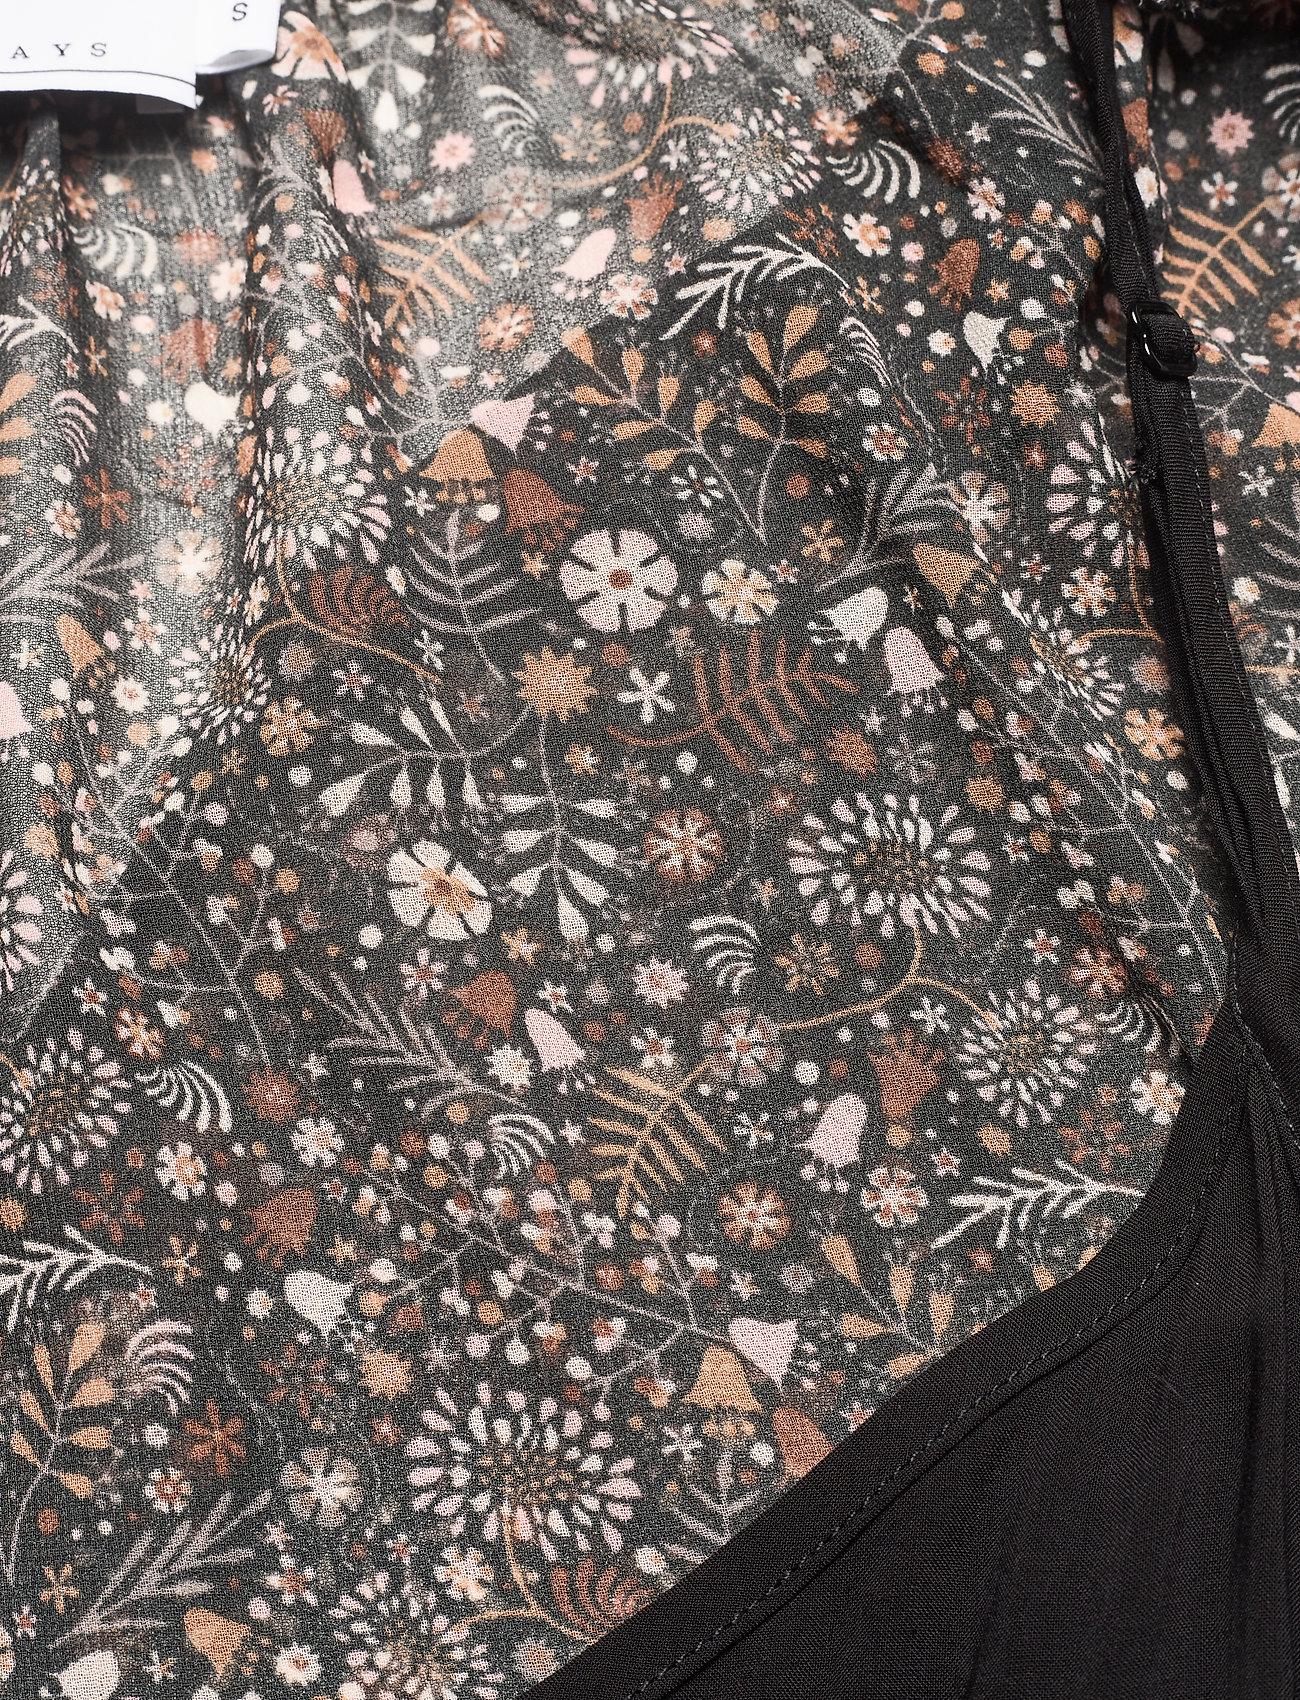 Rocha Print Chiffon (Multi Pink) (1080 kr) - Arnie Says